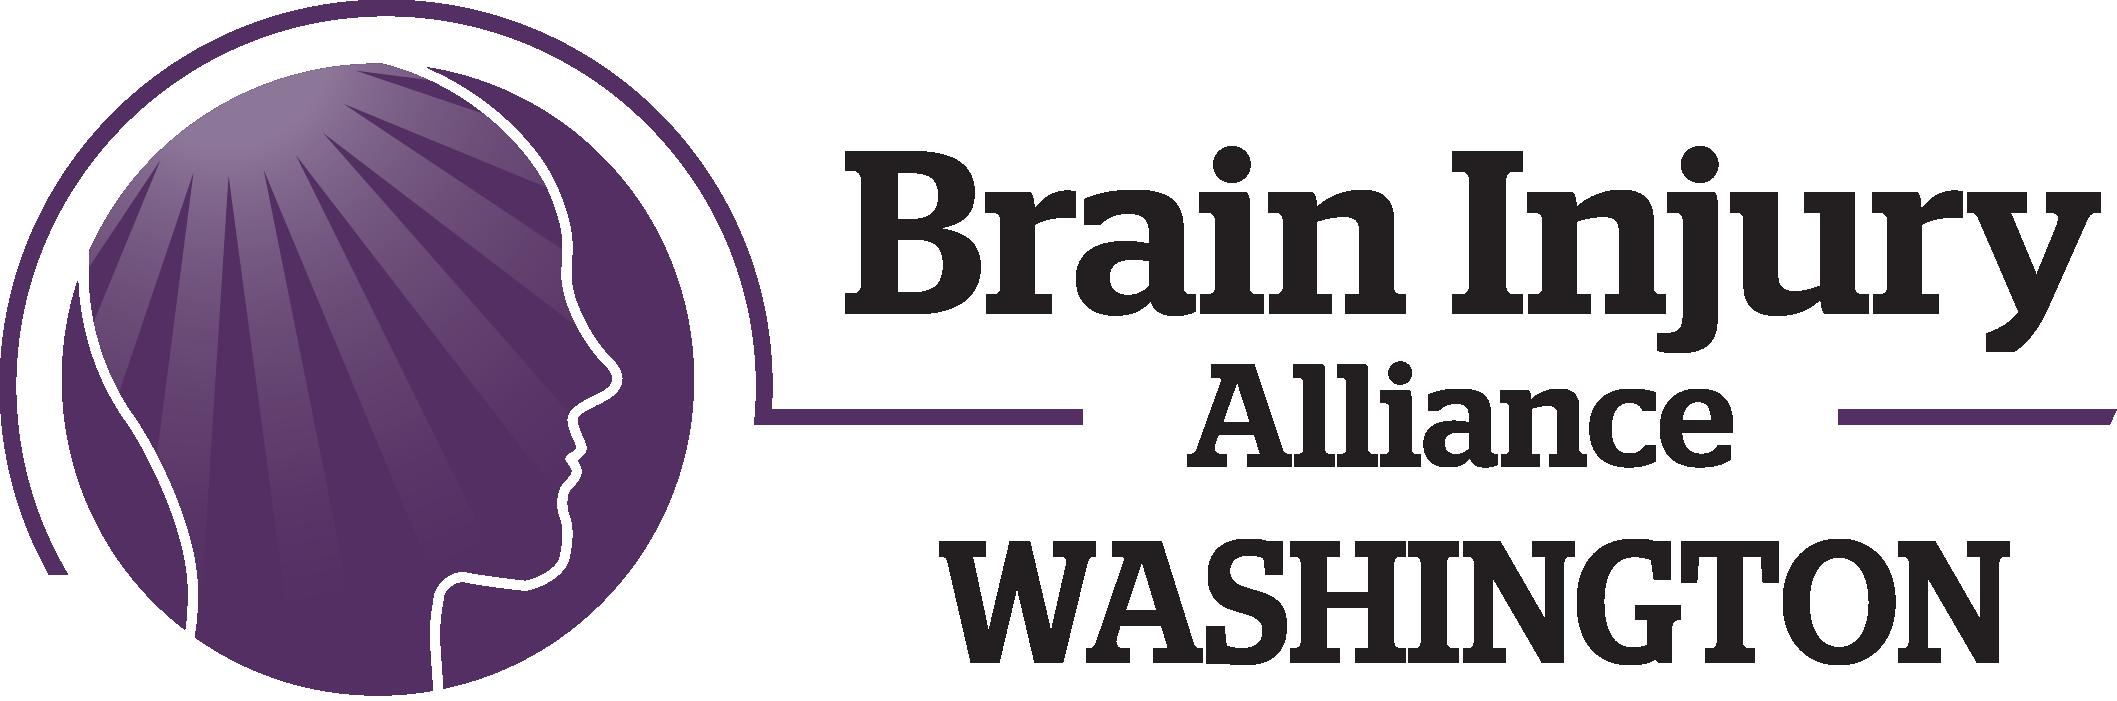 Brian Injury Alliance of Washington